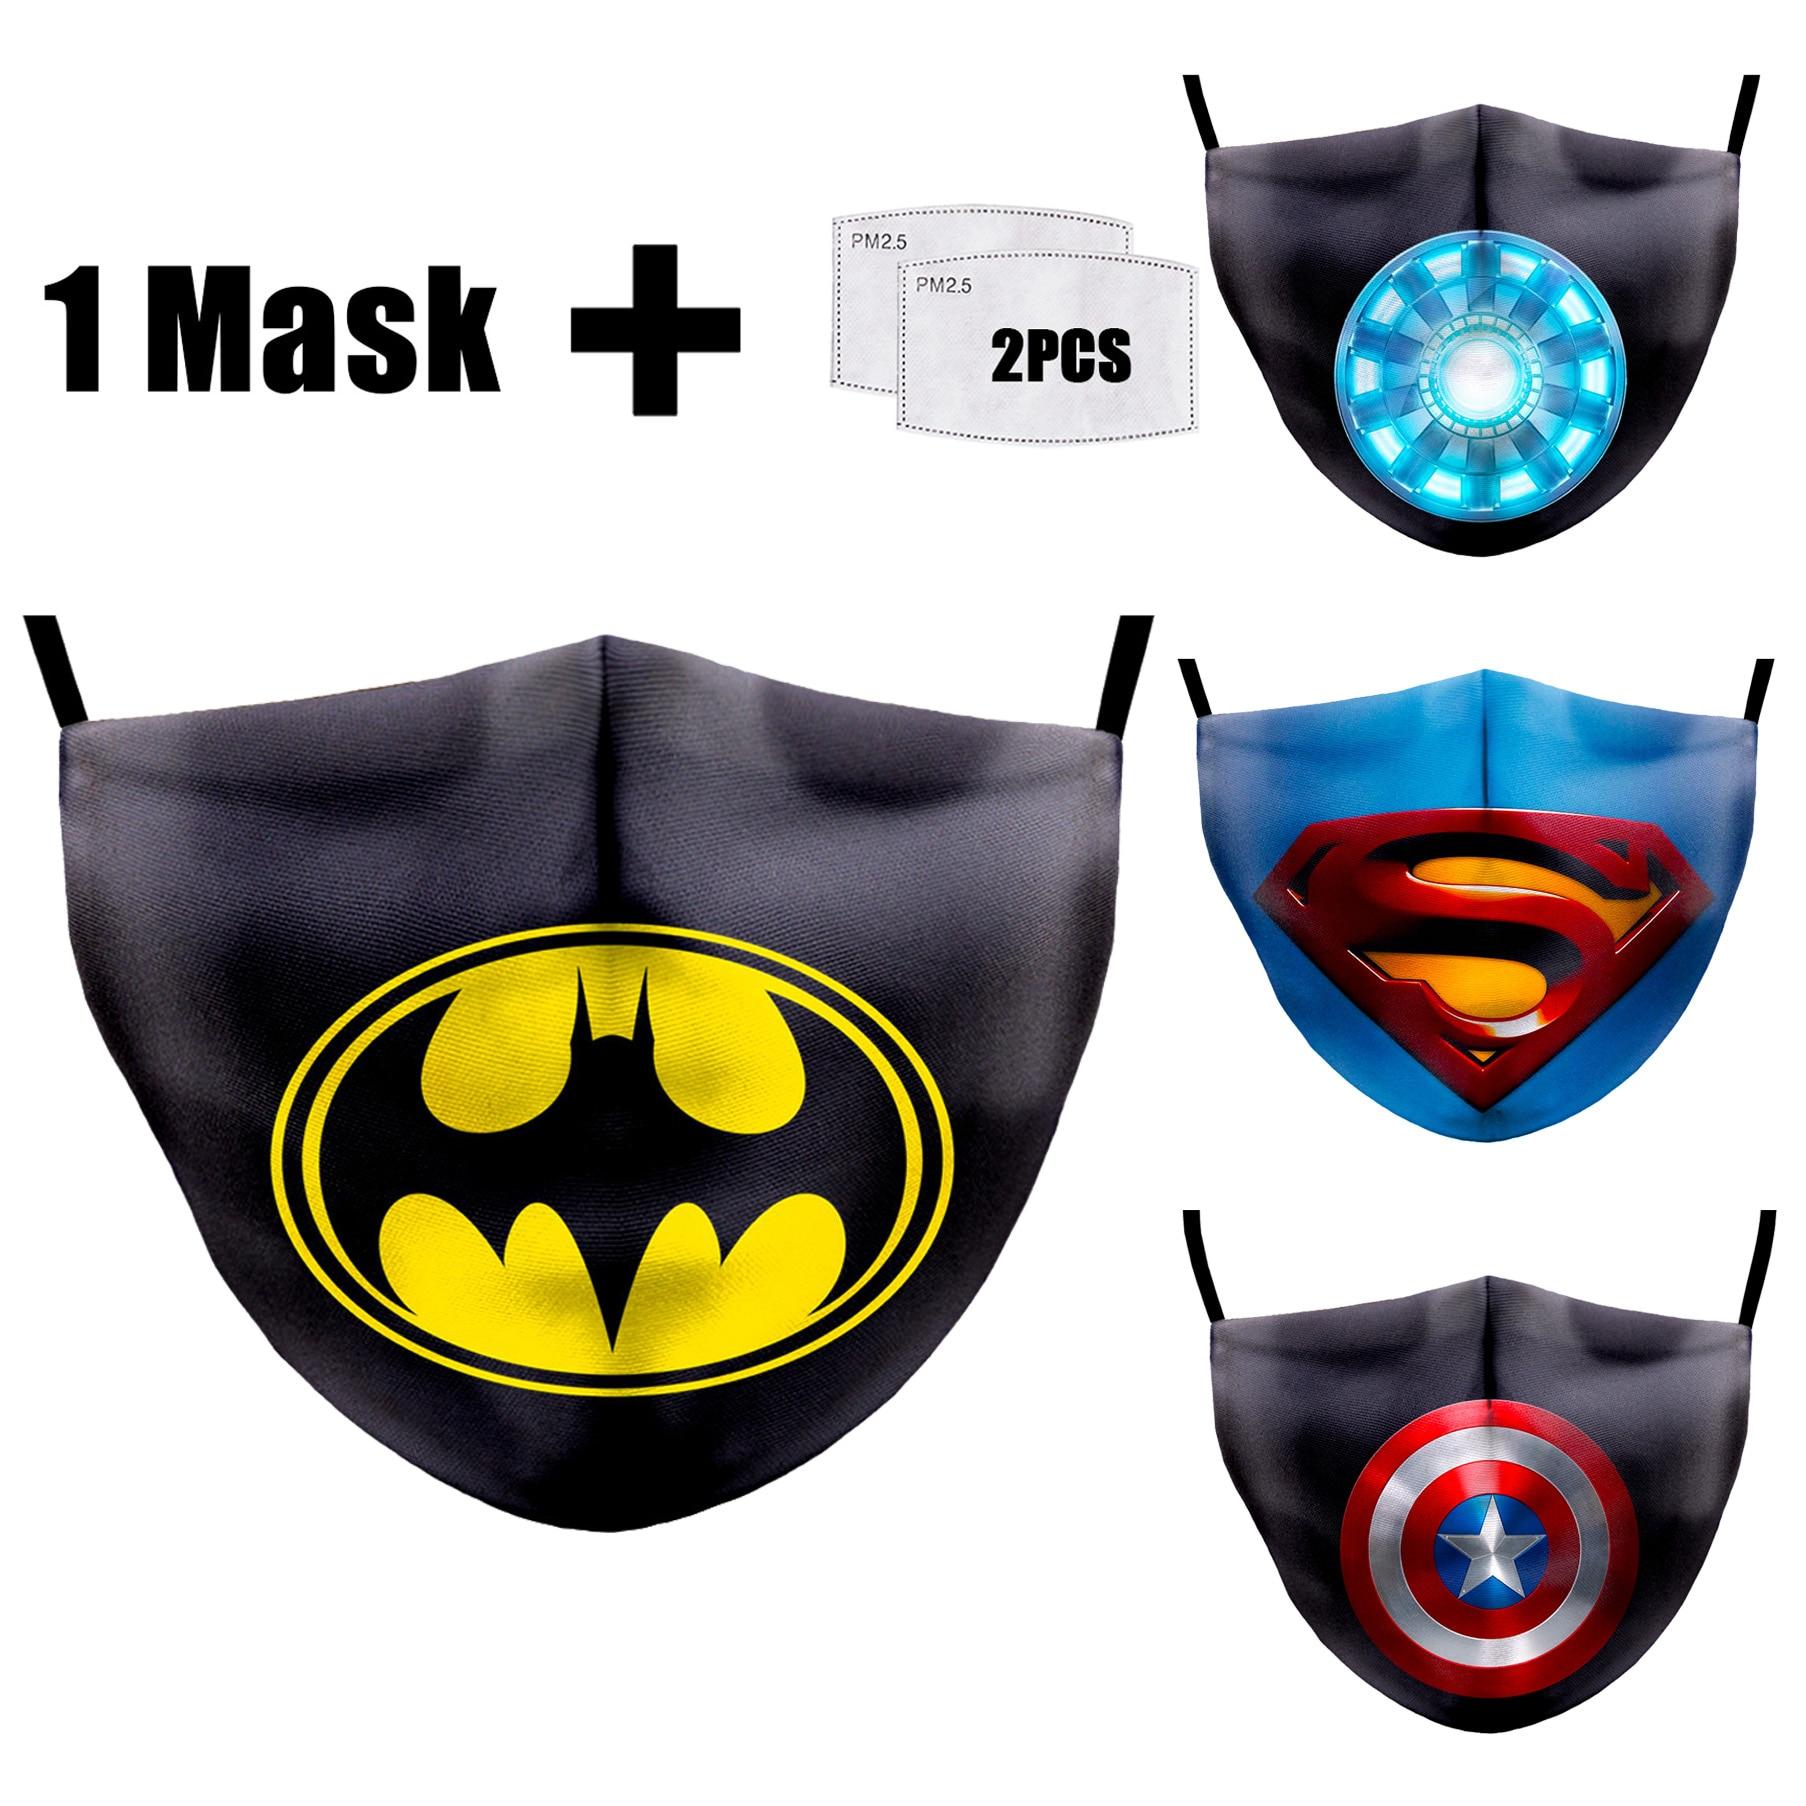 PM2.5 Filter Mouth Masks Washable Batman 3D Printing Masks Fabric Face Masks Reusable PM2.5 Dust Proof Flu Bacteria Face Mask